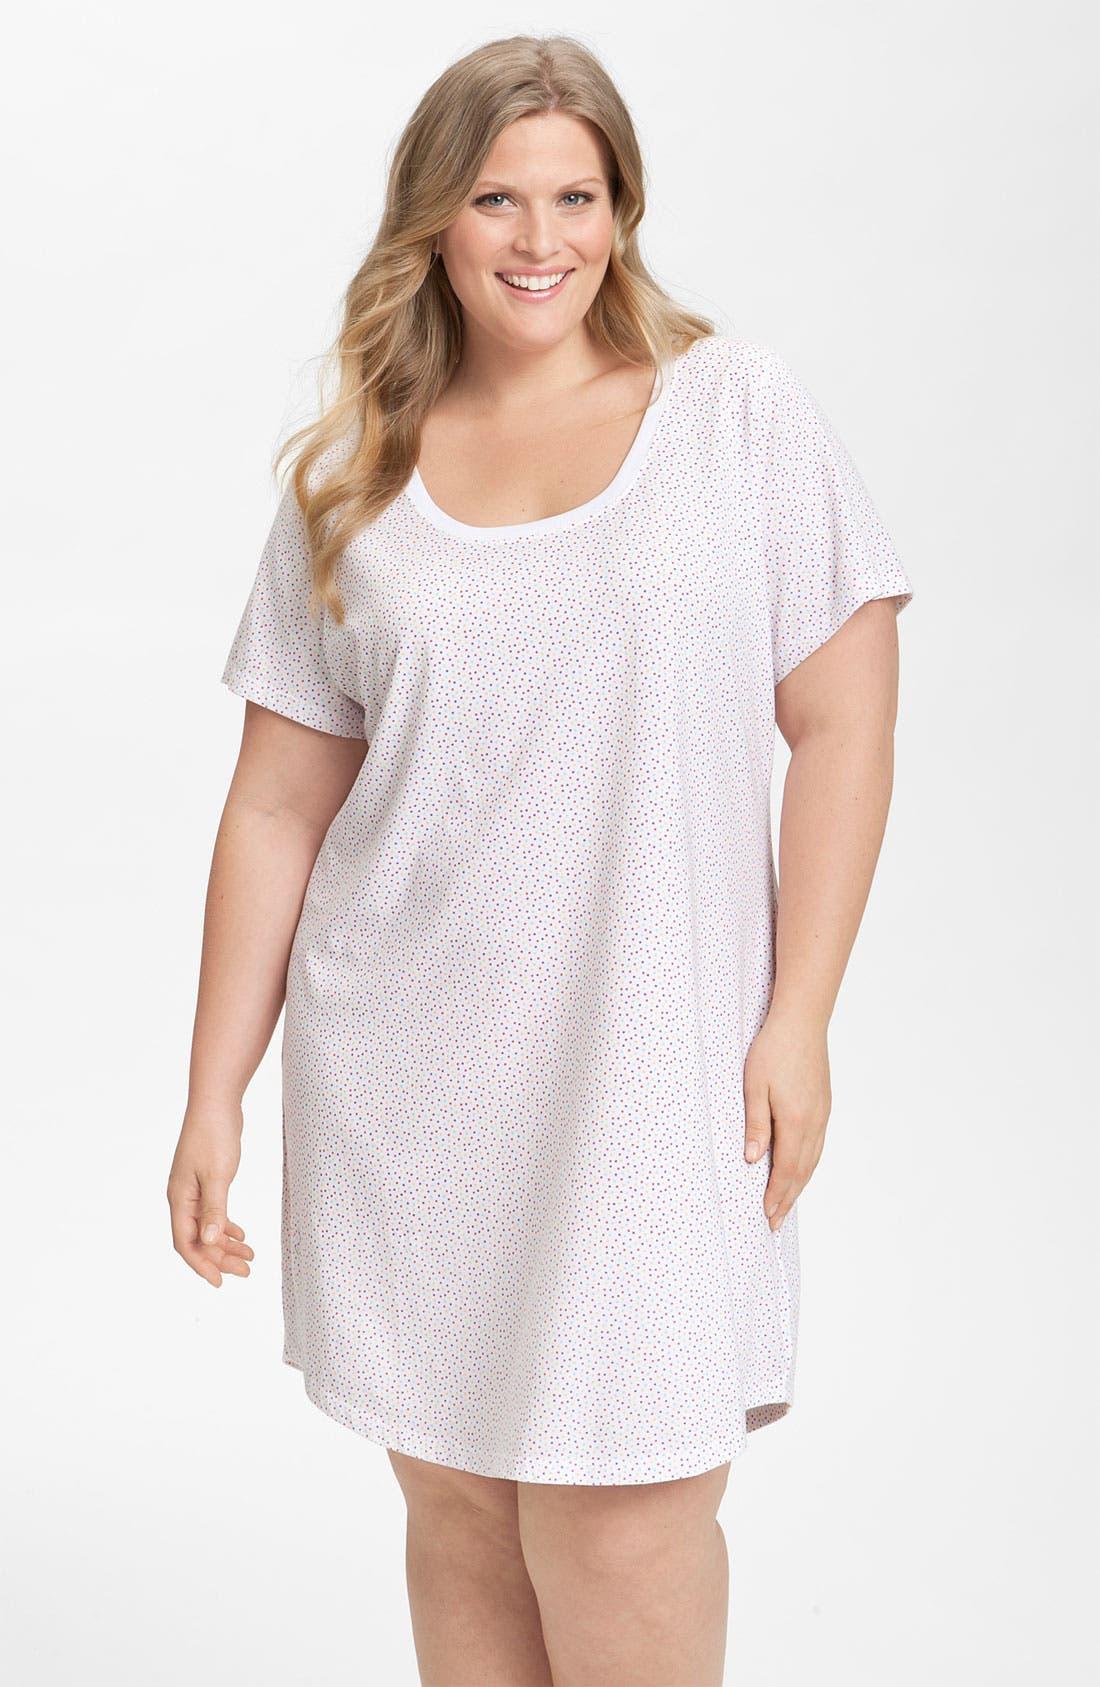 Alternate Image 1 Selected - Nordstrom Short Sleeve Sleep Shirt (Plus)